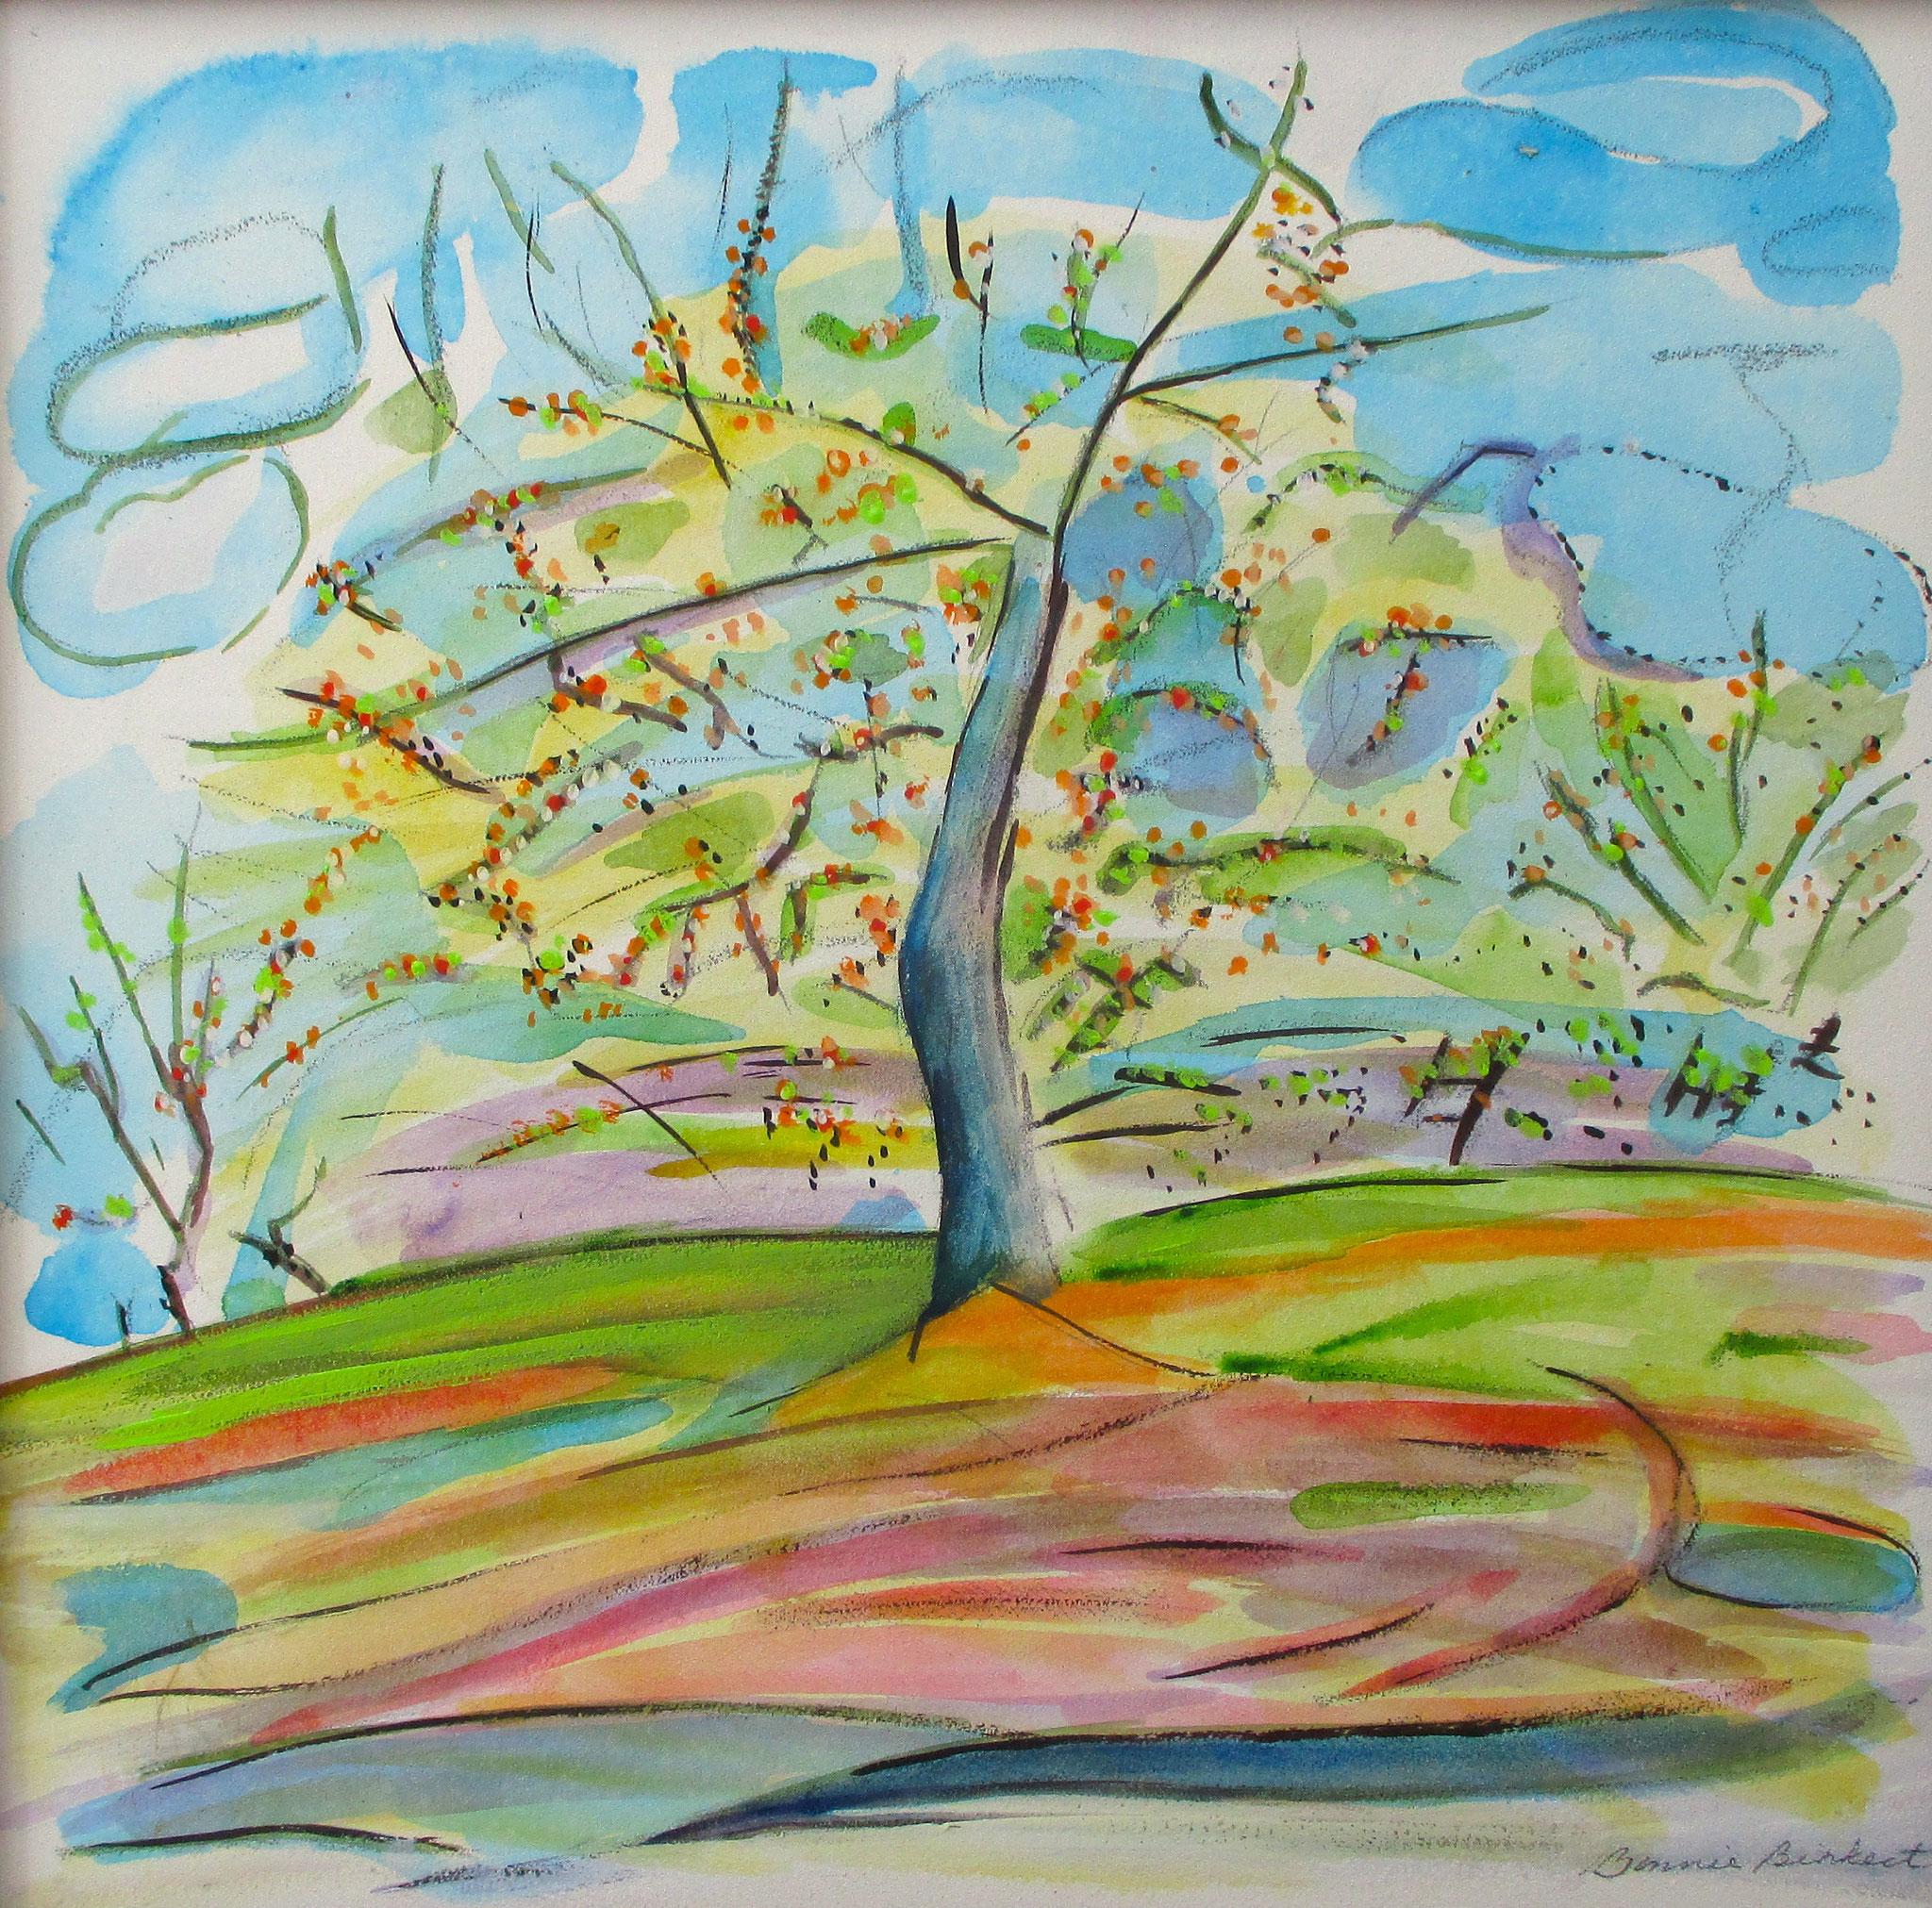 Apricot Season, watercolor on board, 12 x 12, 2016 SOLD